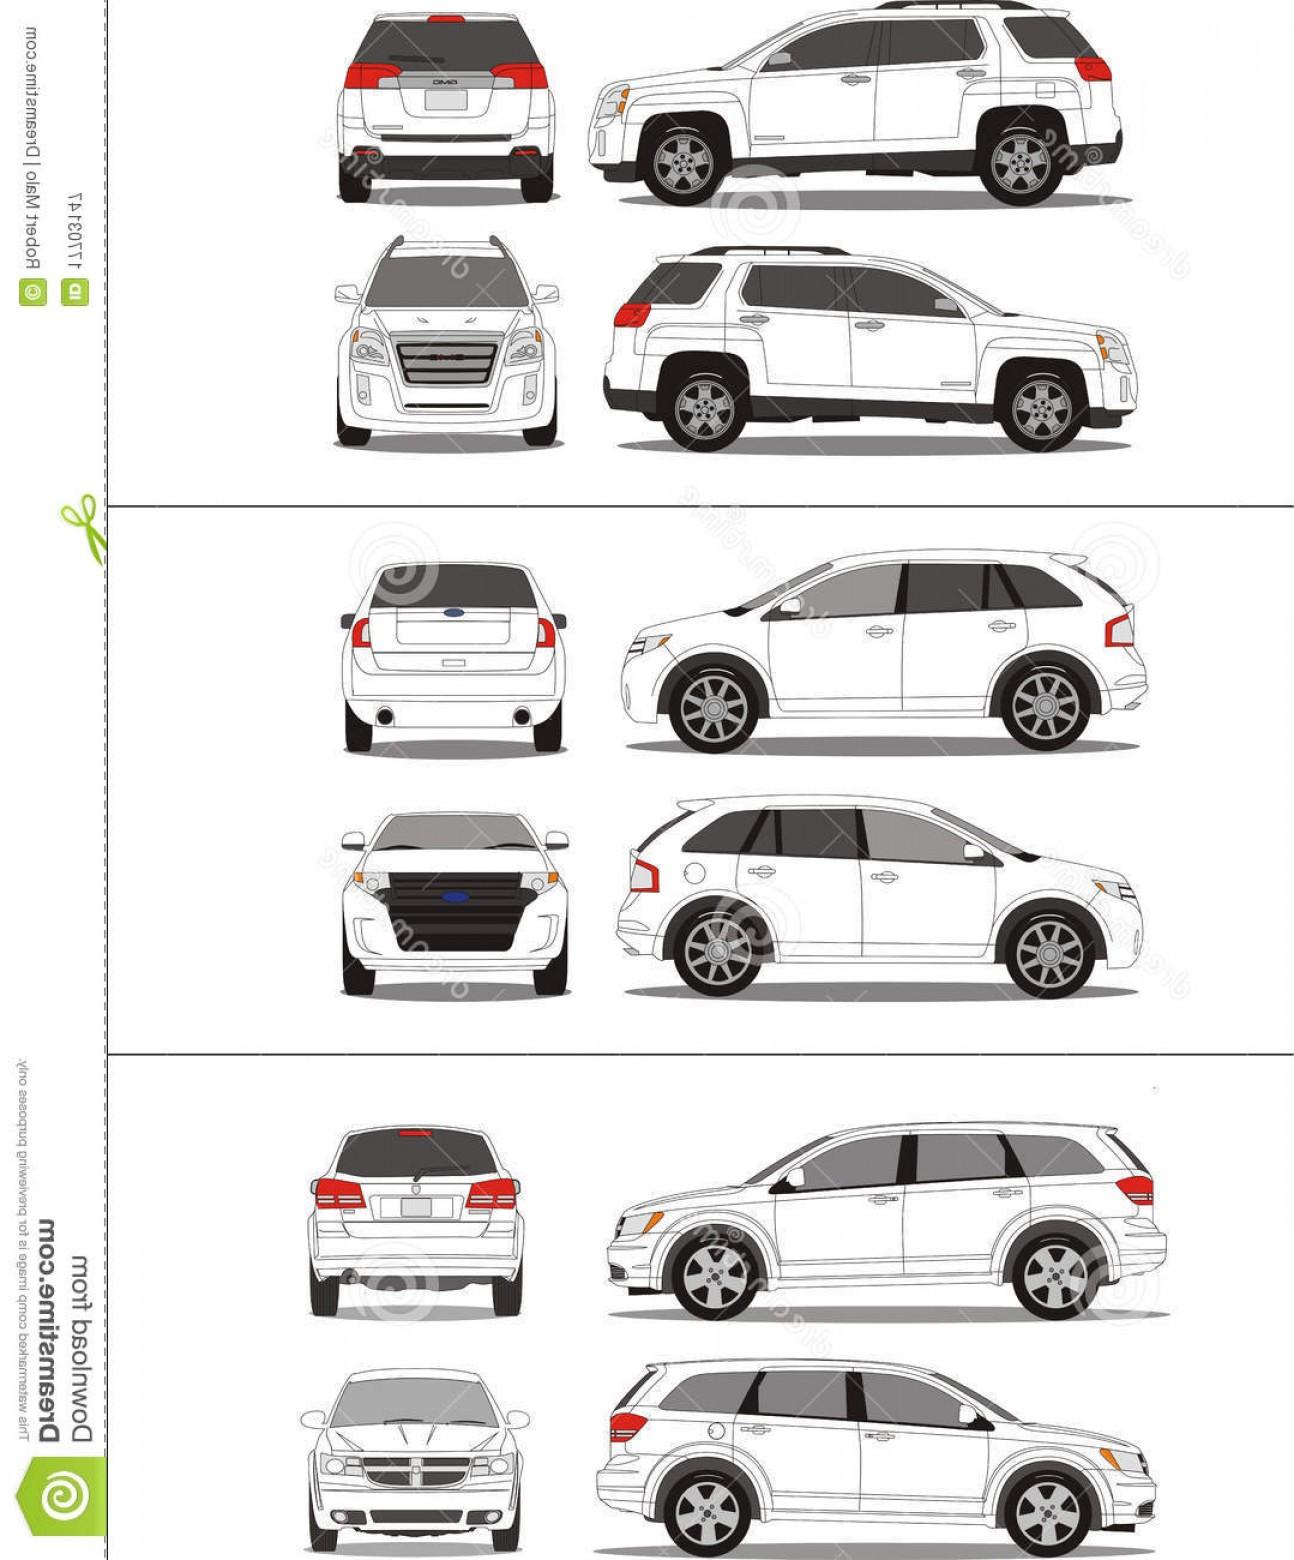 BMW clipart suv Clipart graphic  bmw suv